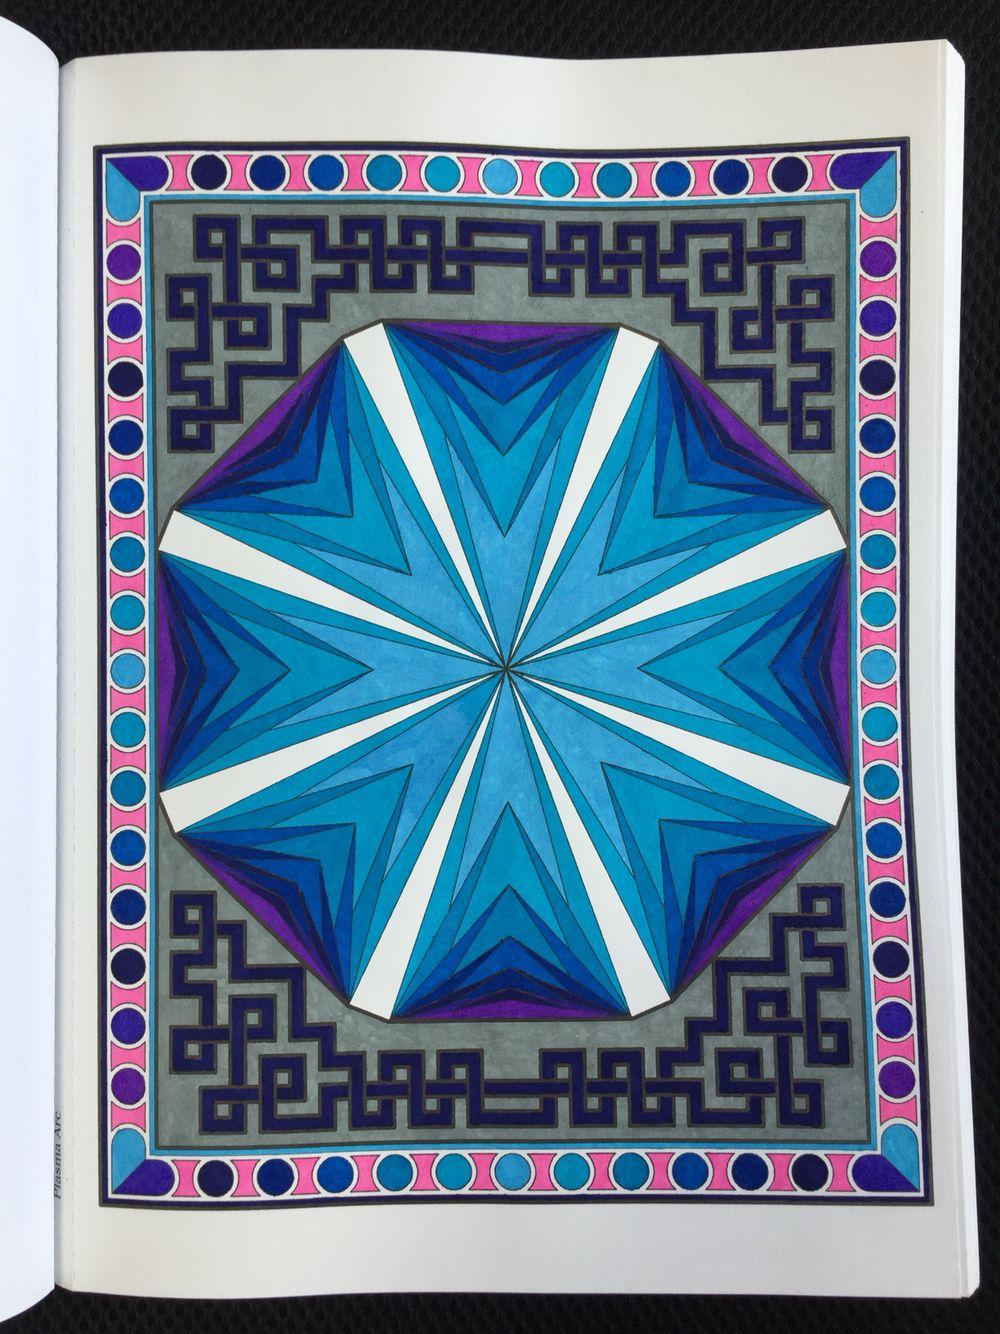 Mesmerizing Mandalas, Randall McVey. Plasma Arc. Page 11. Creative ...